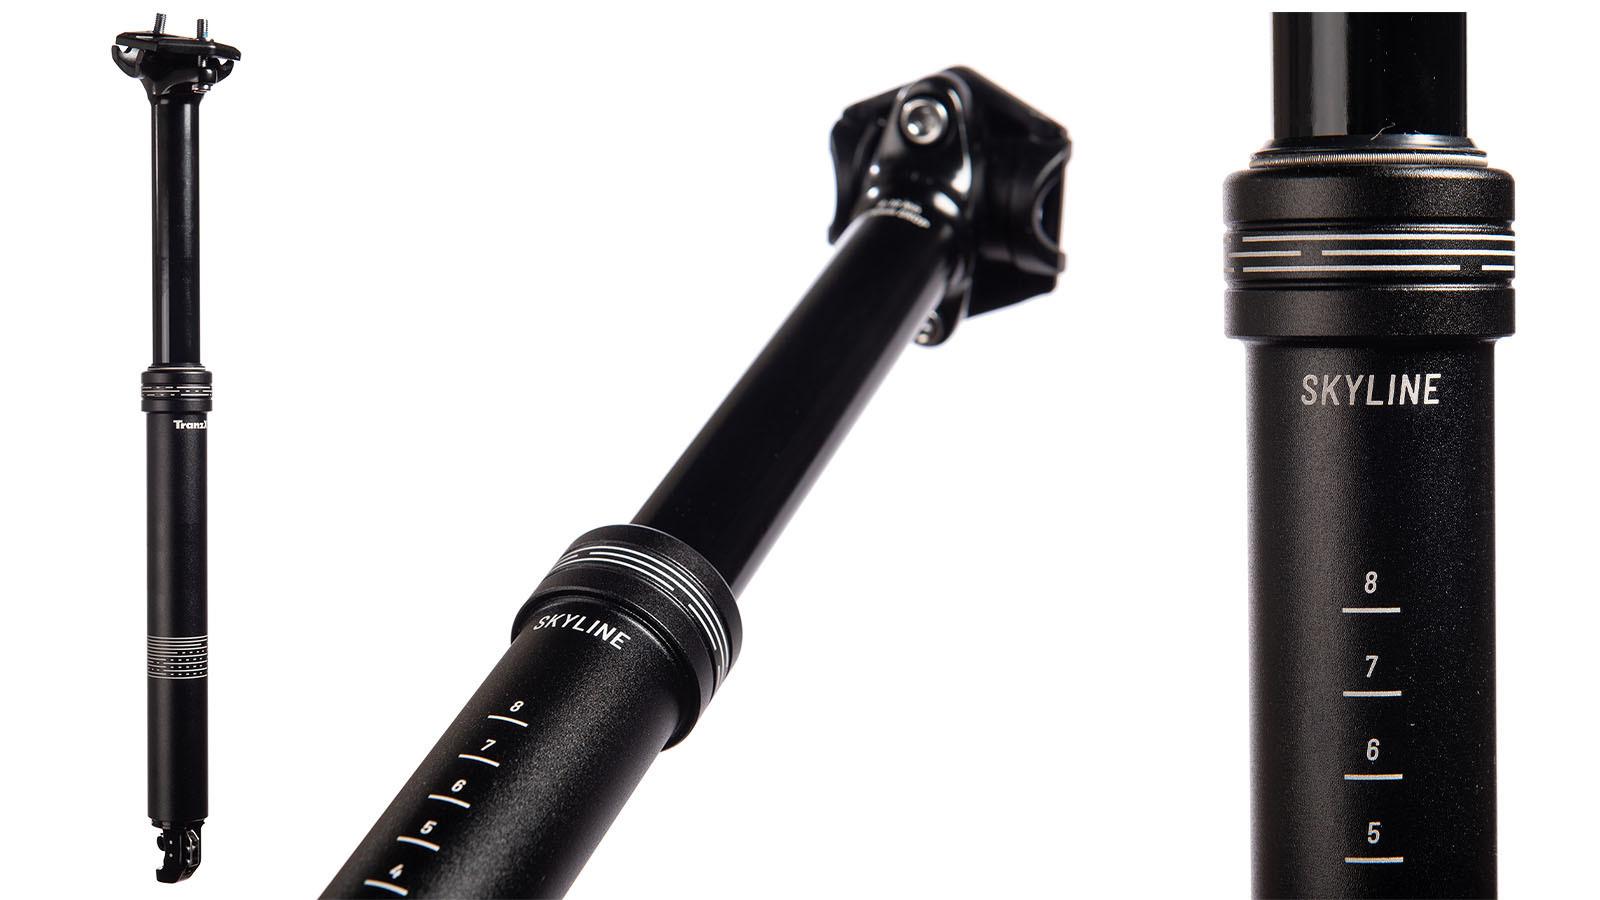 Skyline Dropper Post - 125mm Drop for $99